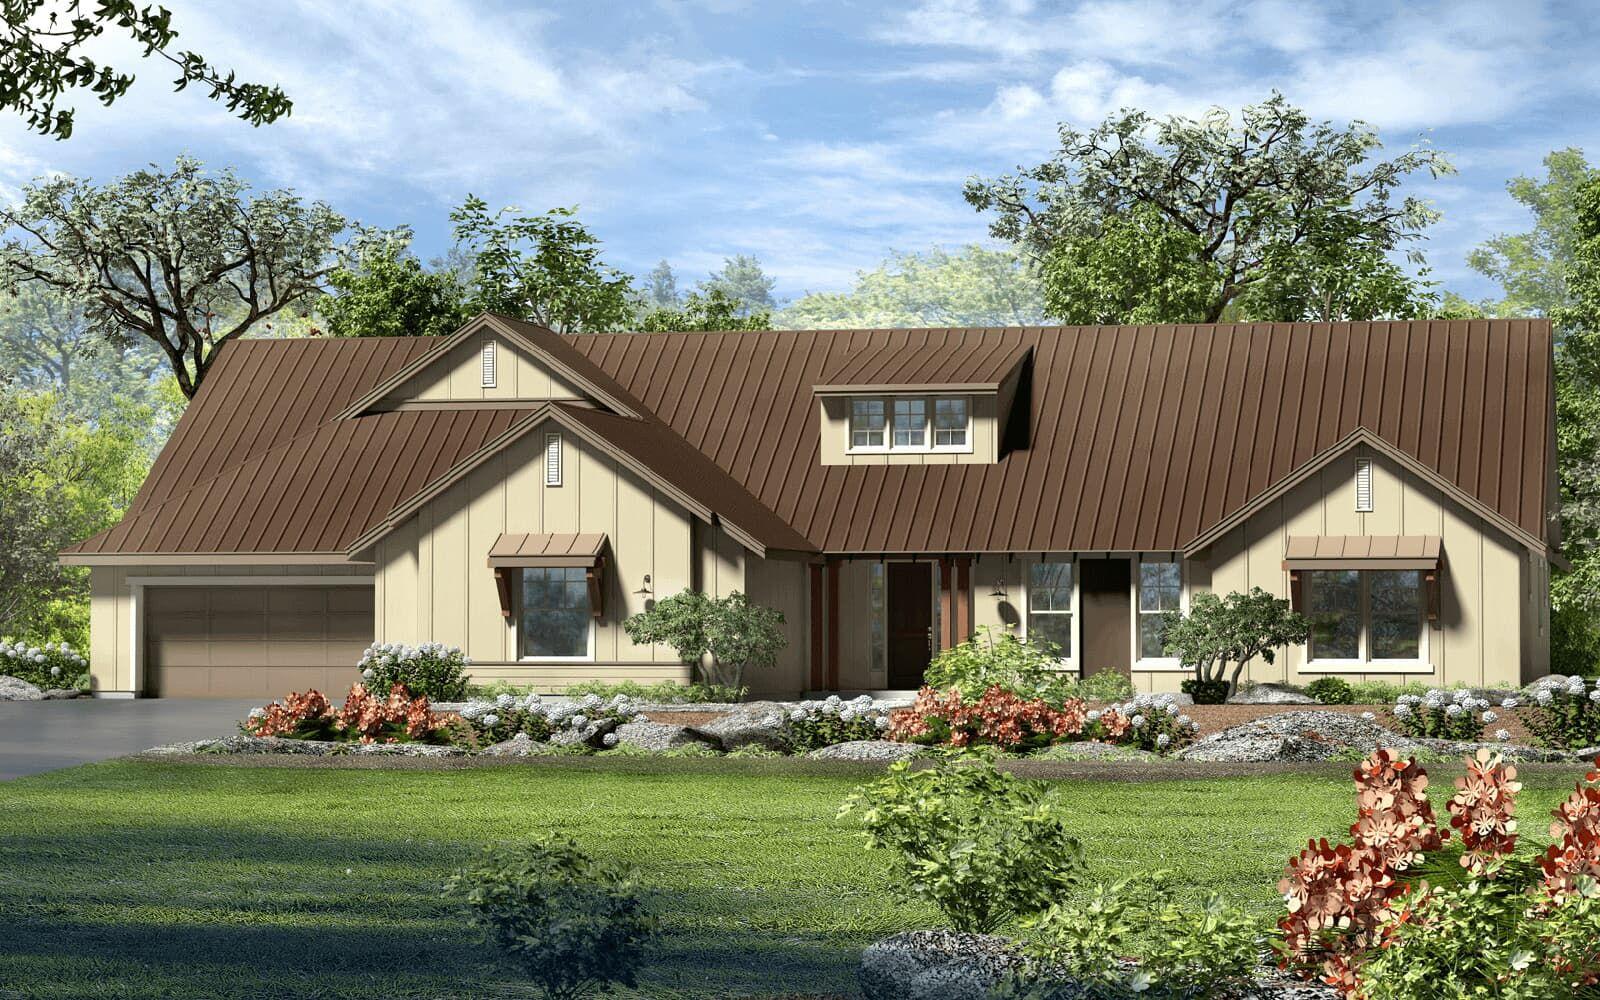 Exterior:floor plan bard modern farmhouse kissing tree san marcos texas